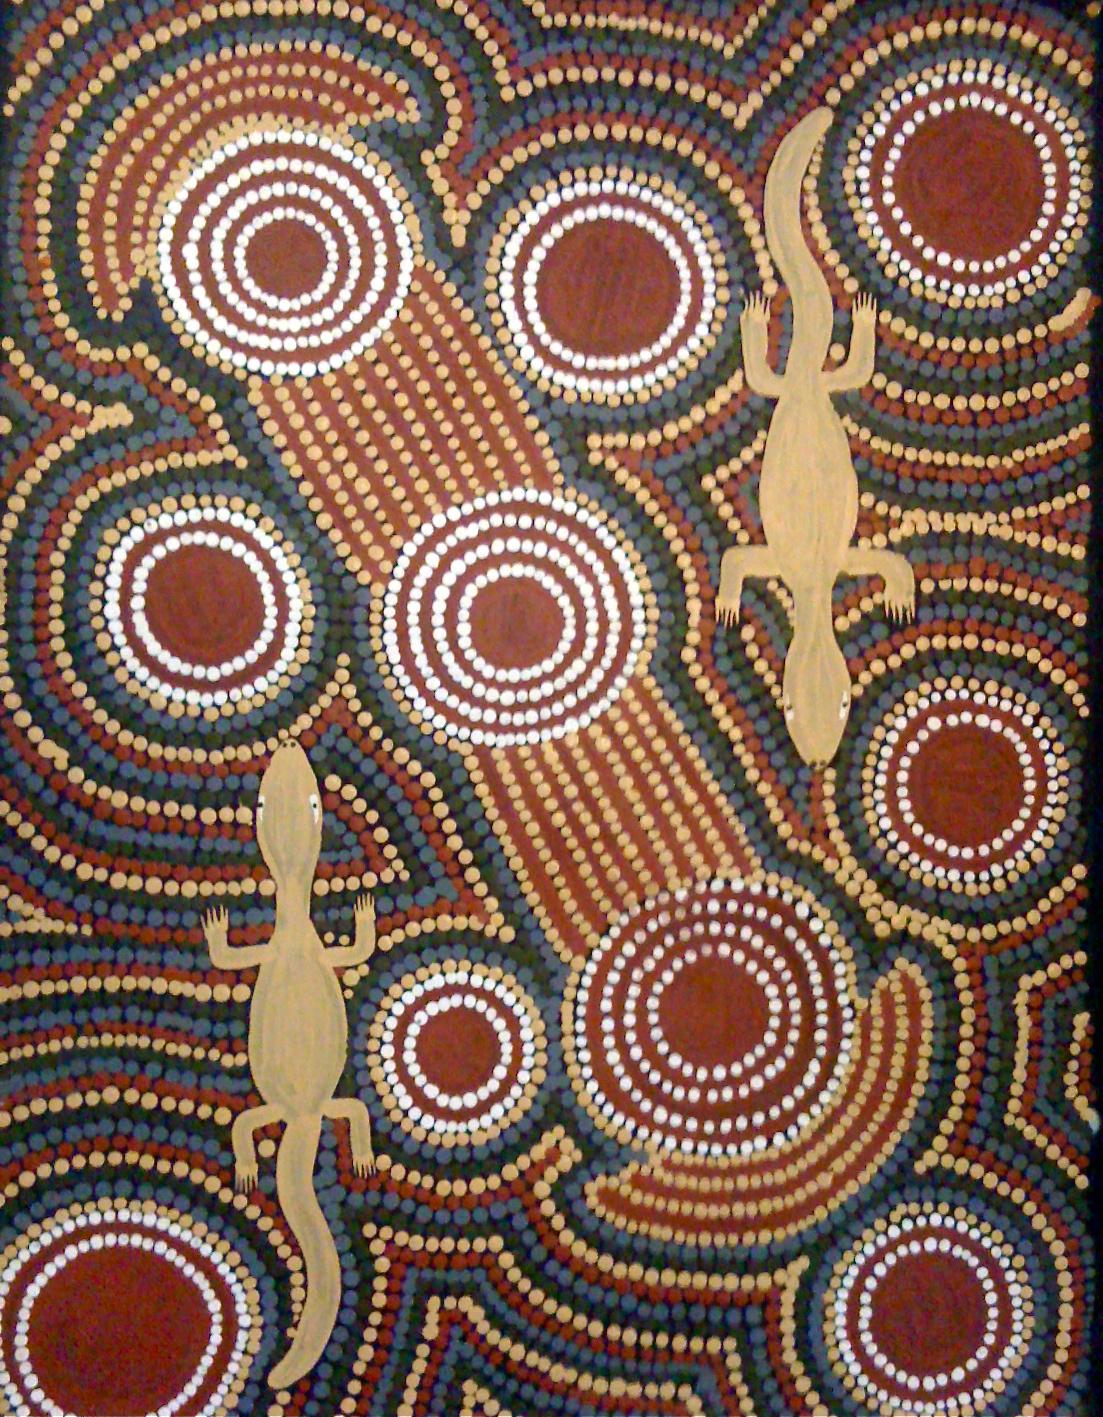 Aboriginal Art Patricia Spencer Nungurrayi Human Behavior